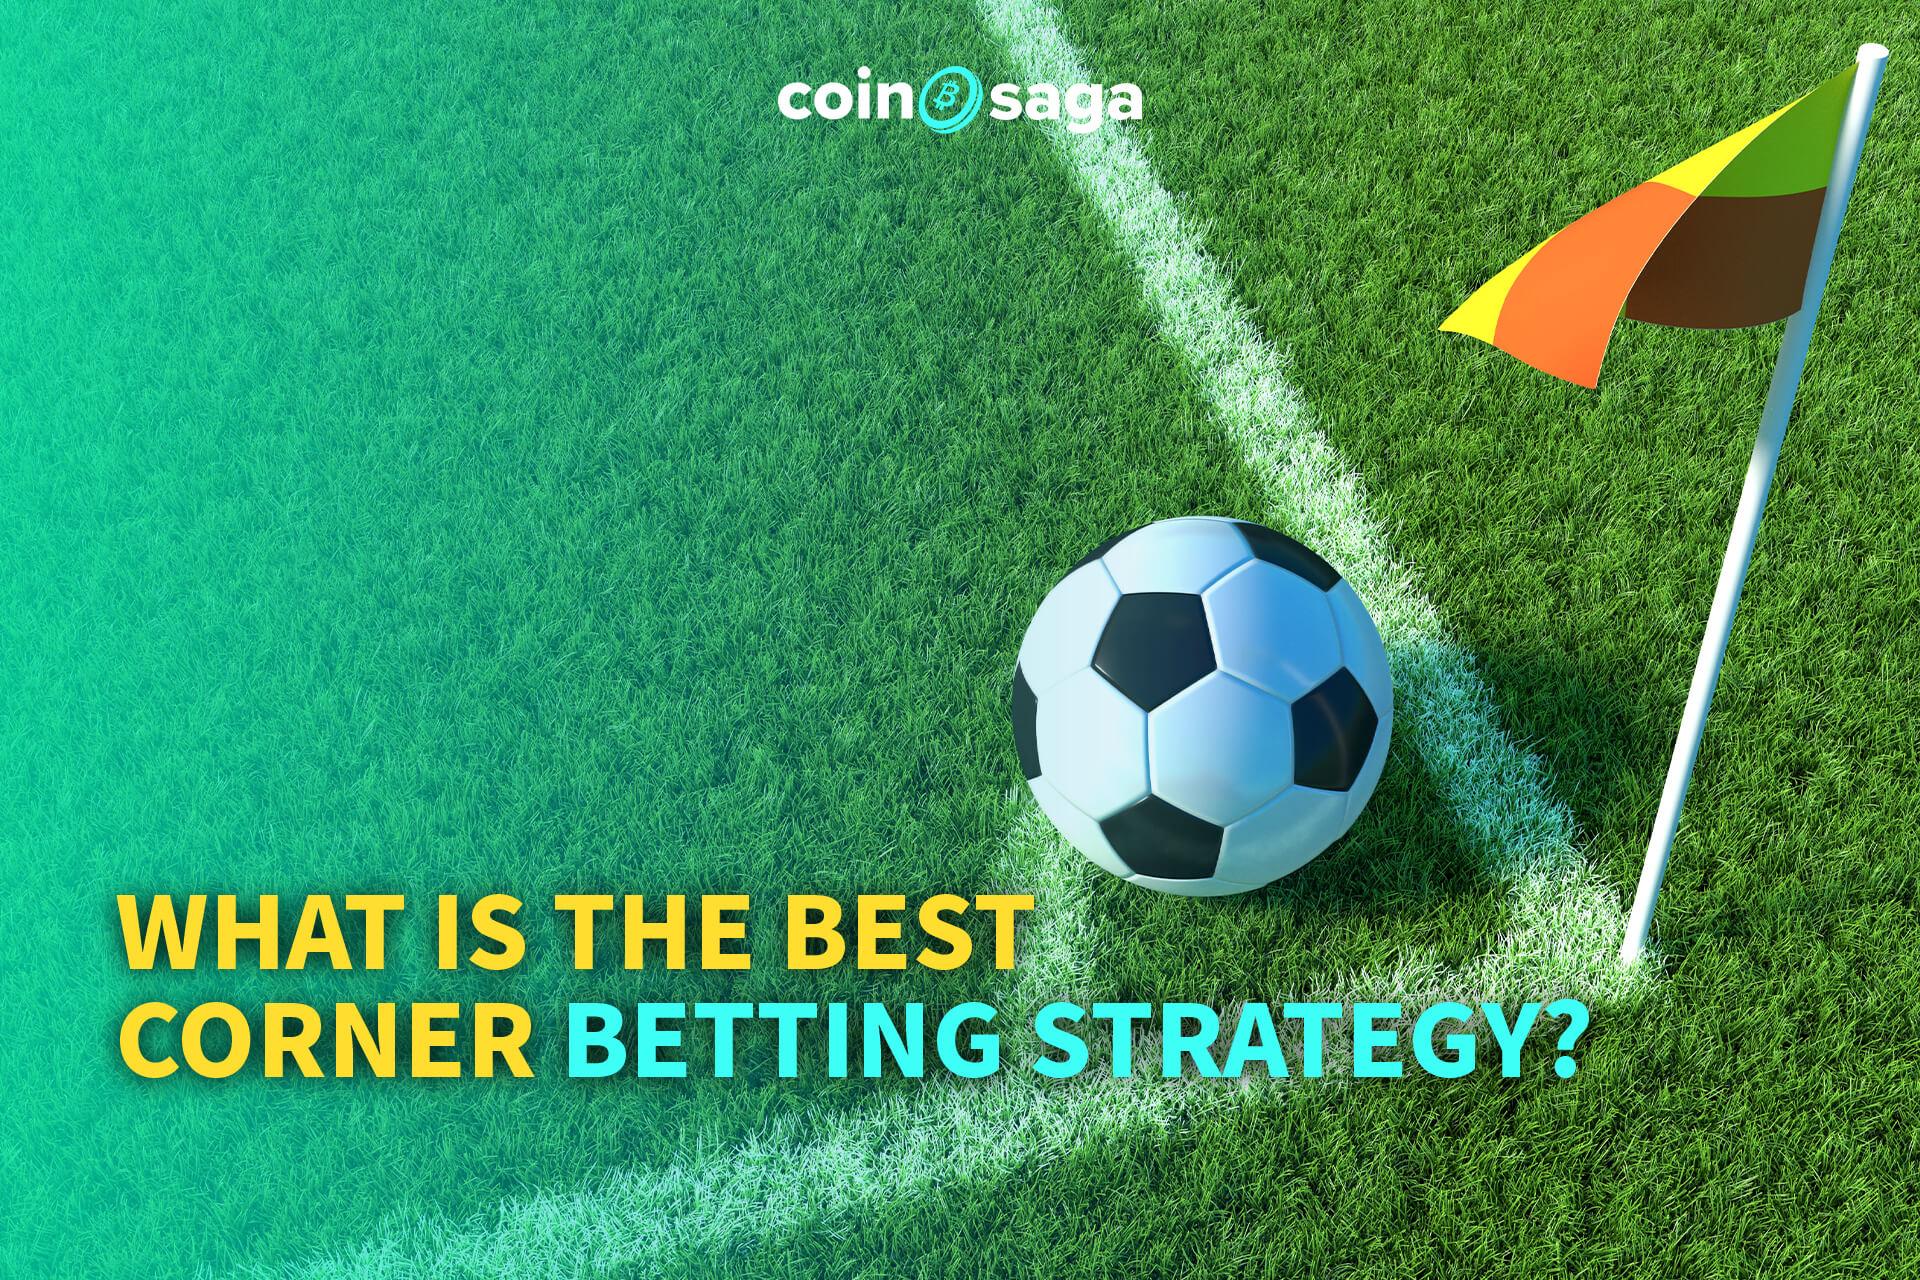 best corner betting strategy